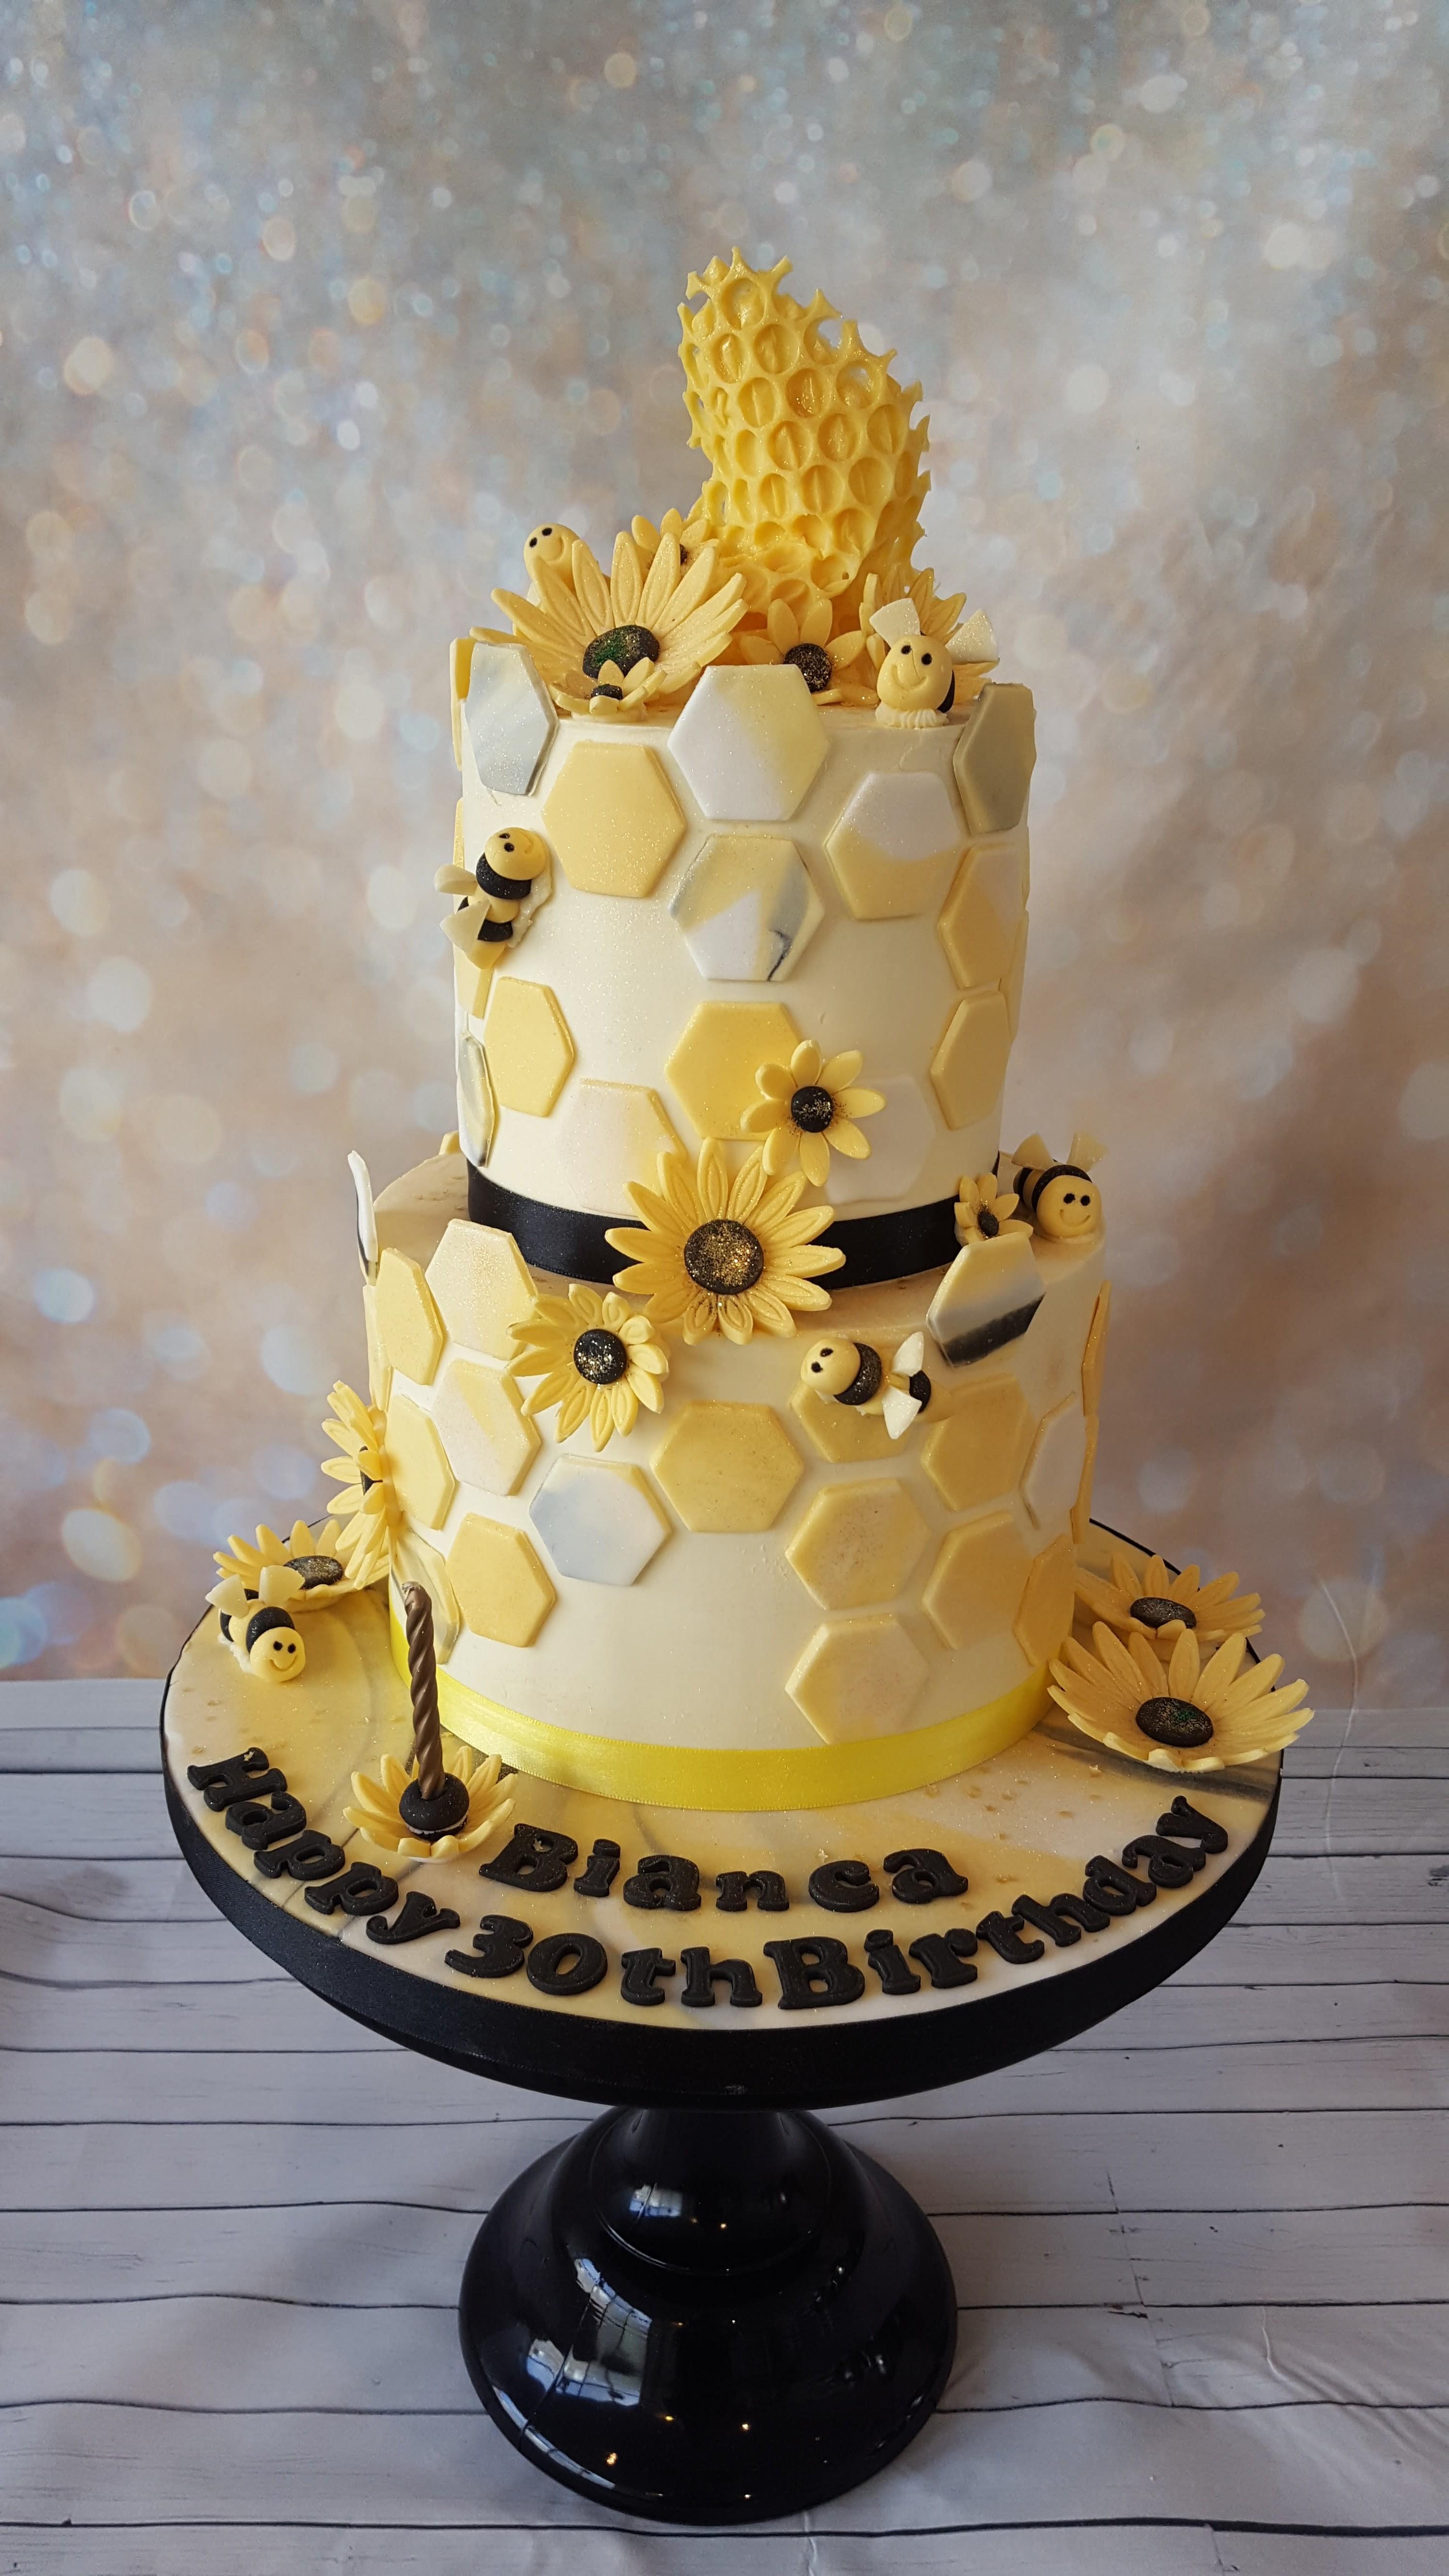 Admirable Birthday Cake Bristol City Of Bristol Quirky Cakes Bristol Funny Birthday Cards Online Inifofree Goldxyz